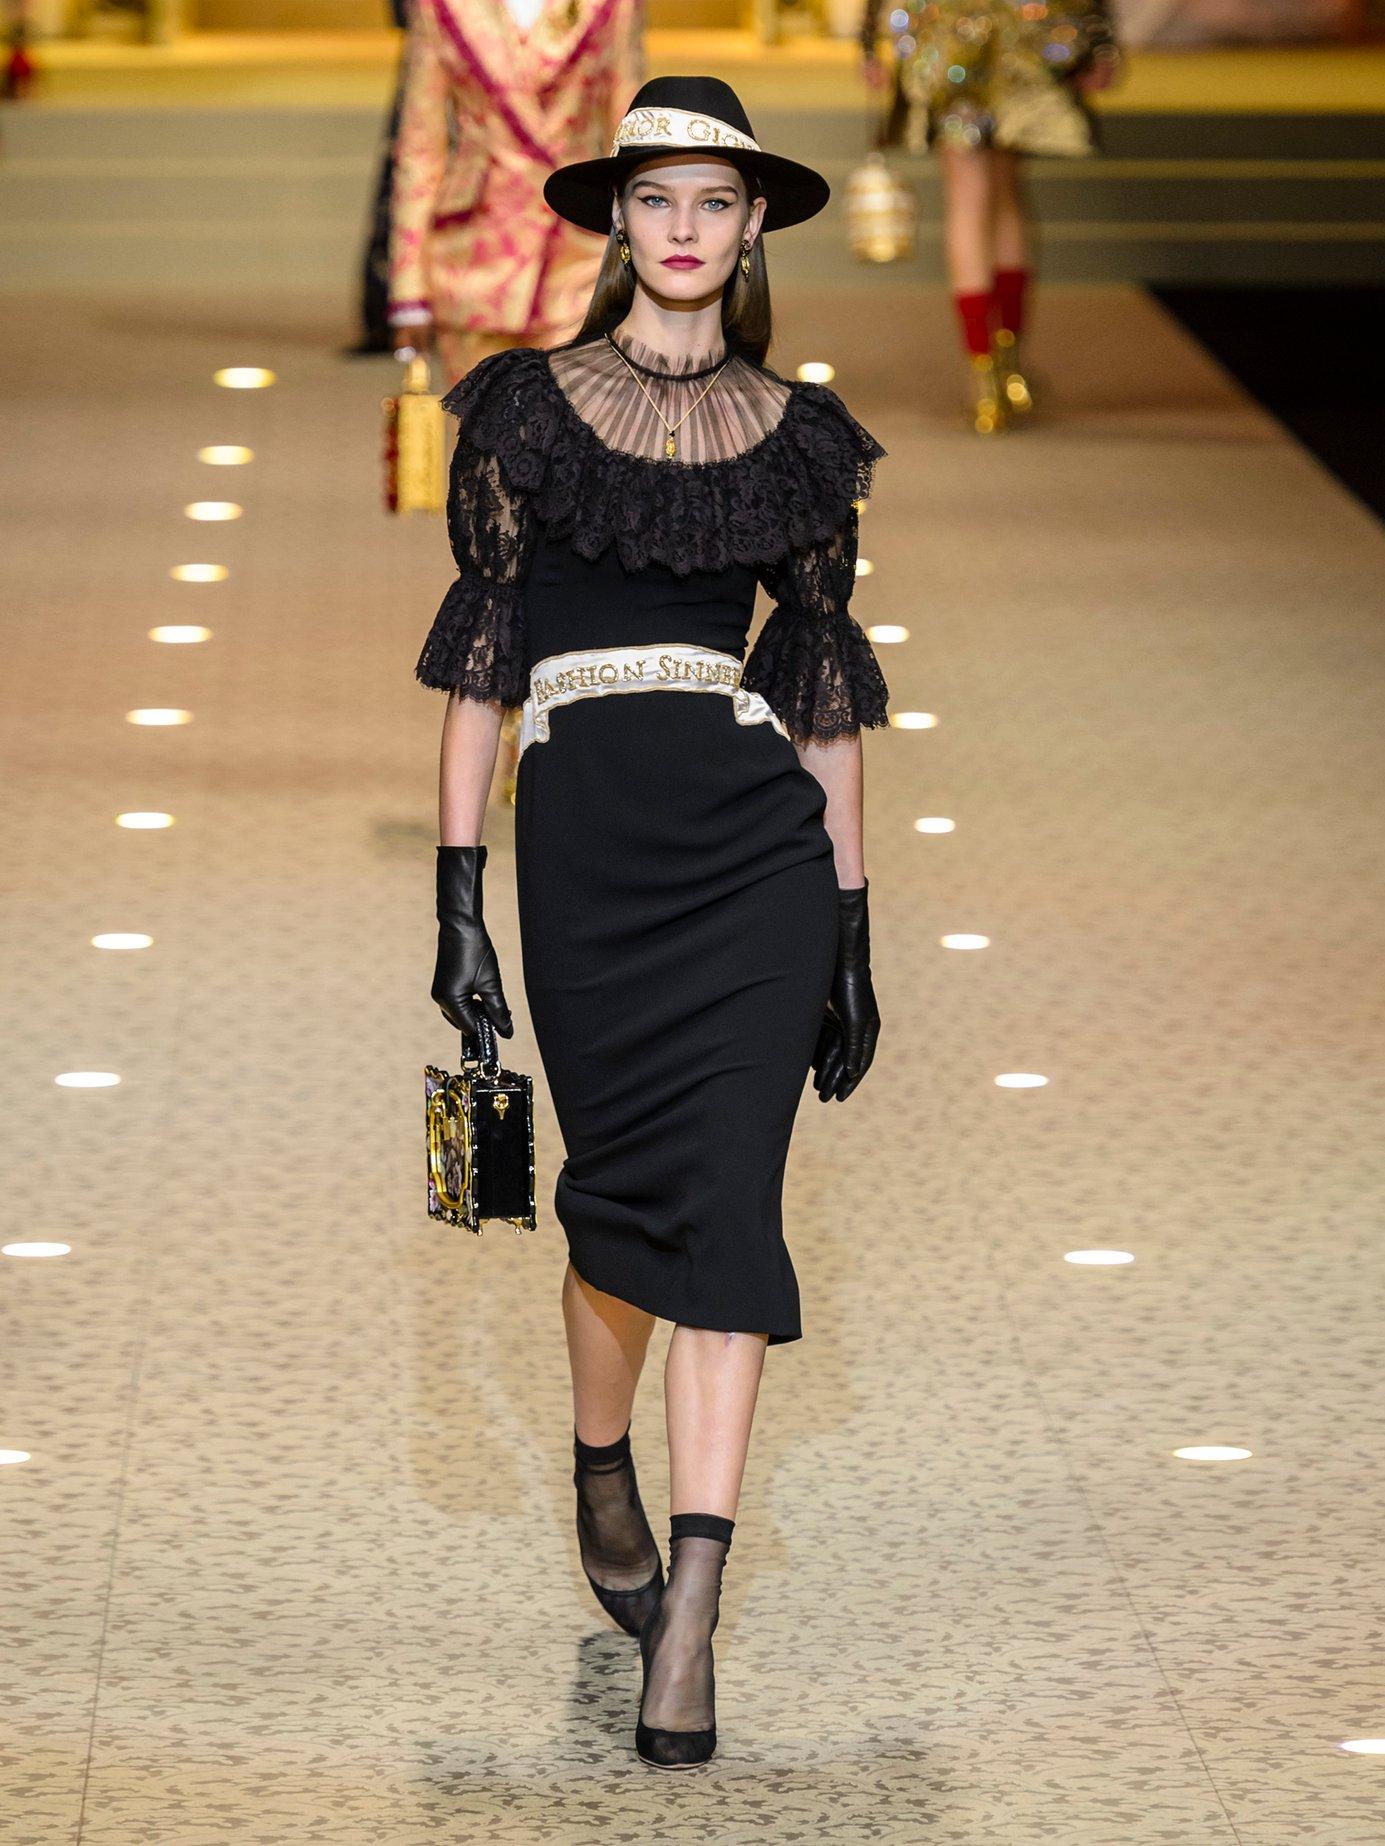 Fashion Sinner-embroidered midi dress by Dolce & Gabbana